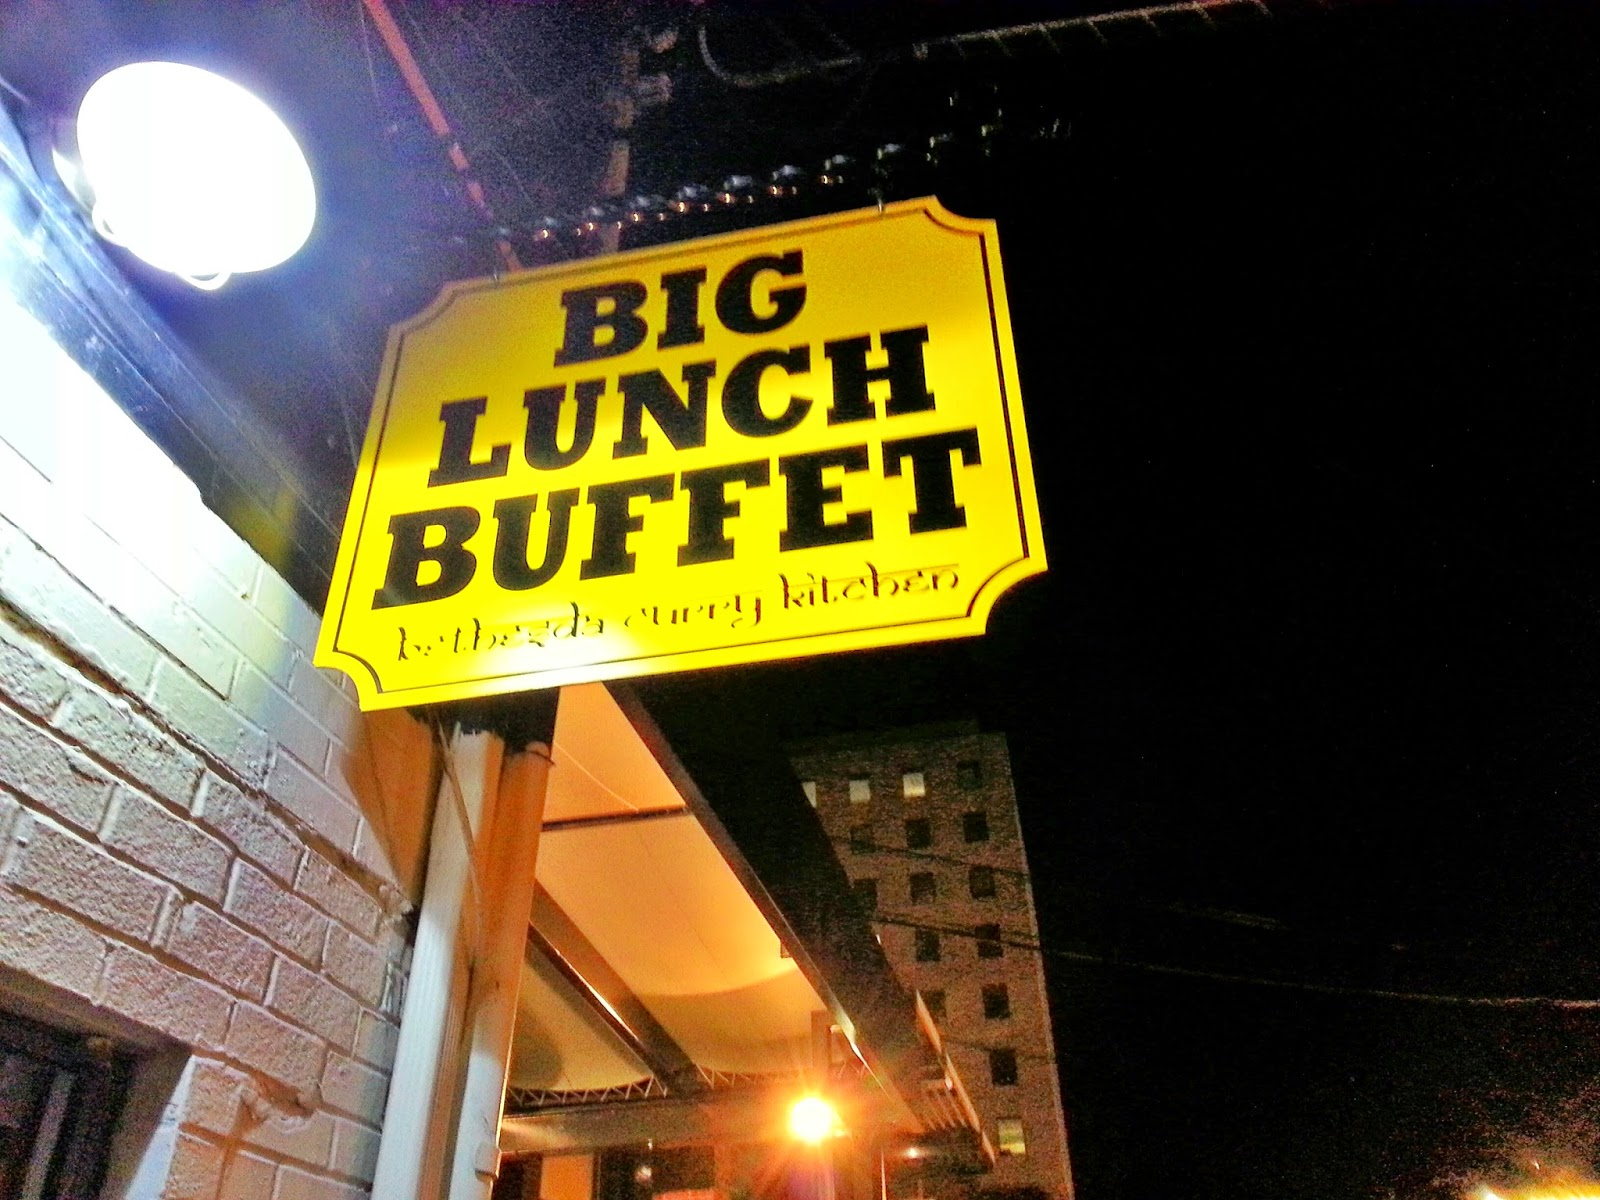 Ritz Camera Bethesda Curry Kitchen Touts Big Lunch Buffet Photos